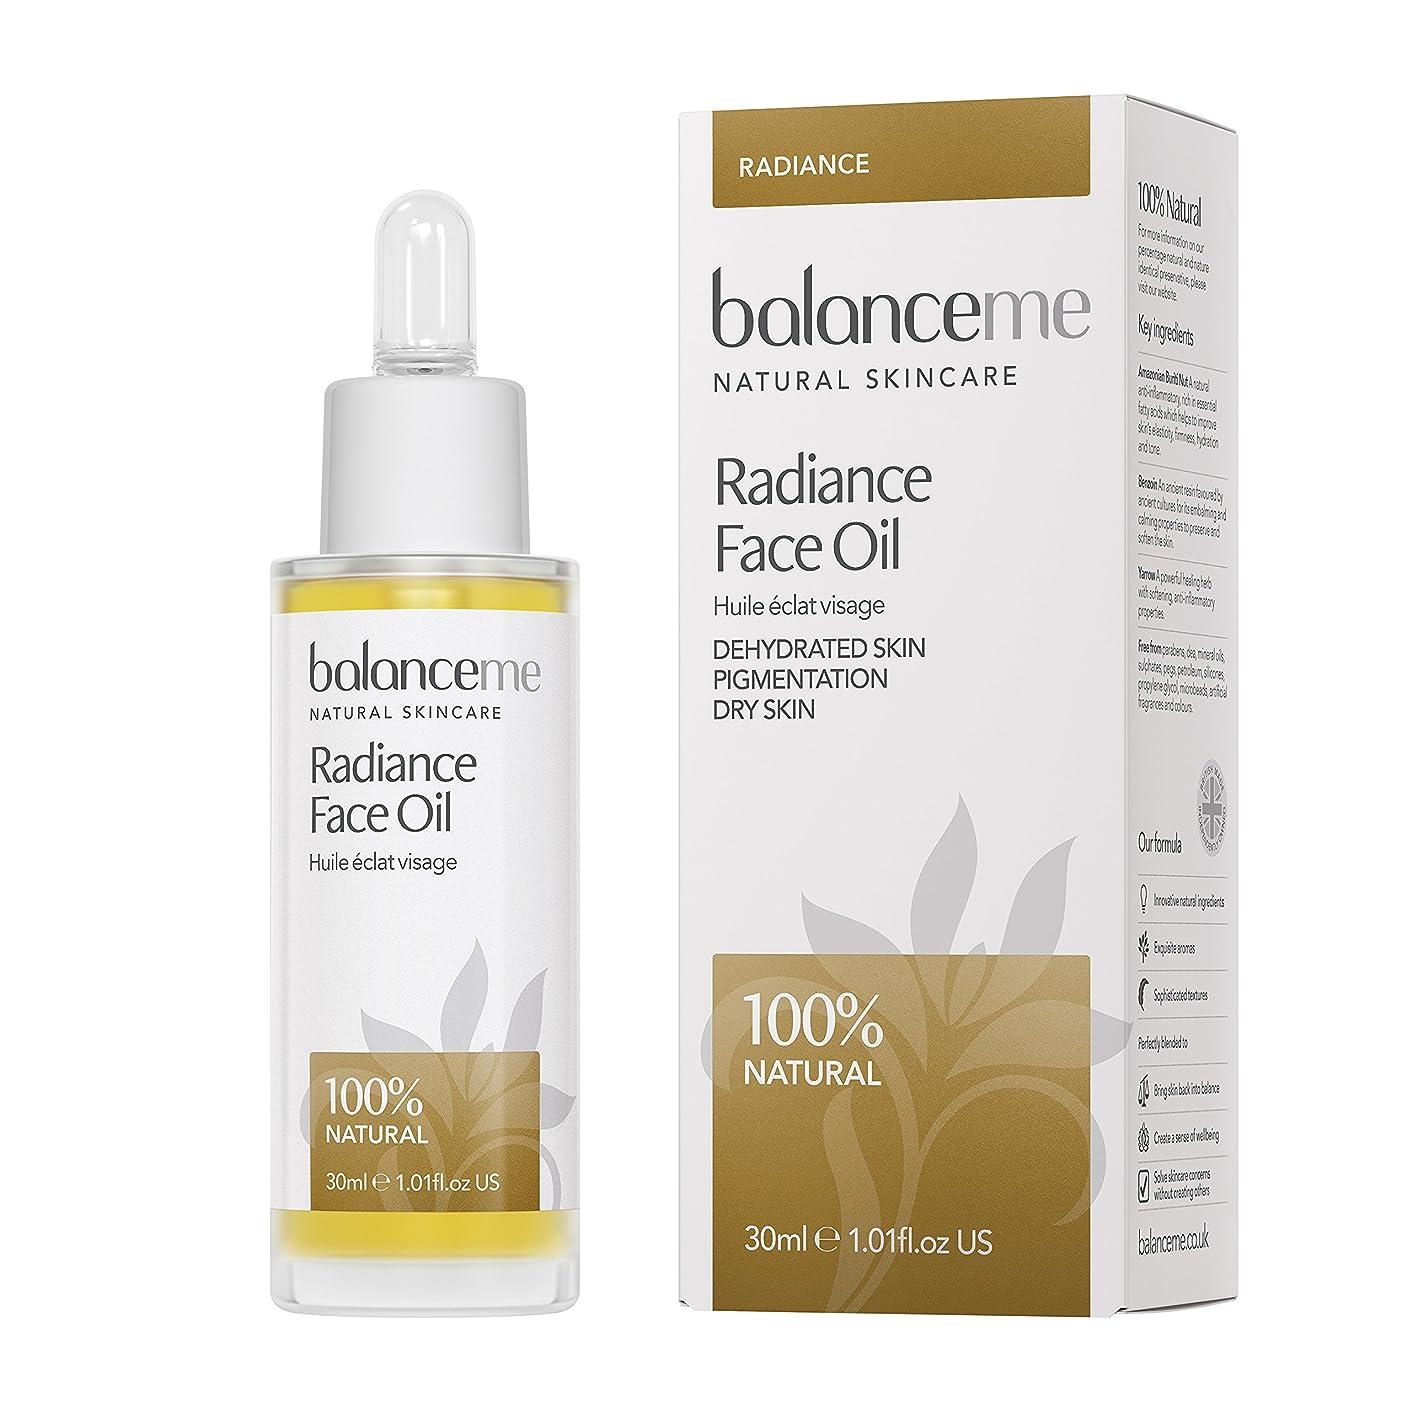 Balance Me Radiance Face Oil 30 ml